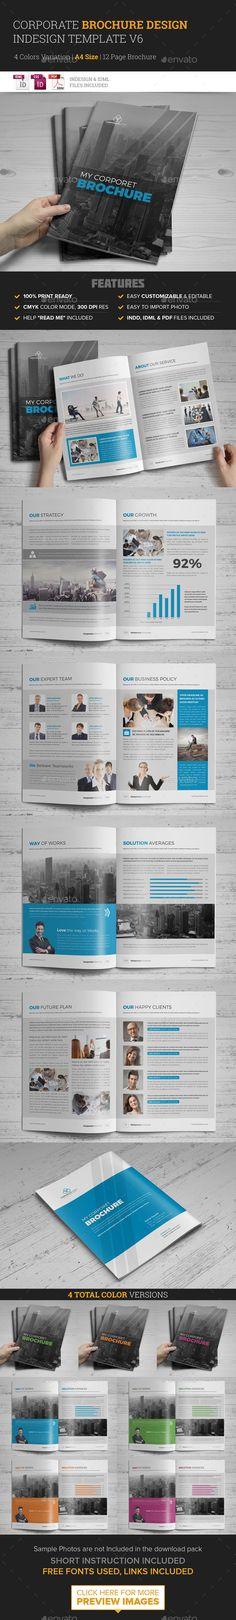 Corporate Multipurpose Brochure Template #design #print Download: http://graphicriver.net/item/corporate-multipurpose-brochure-template-v6-/11943795?ref=ksioks